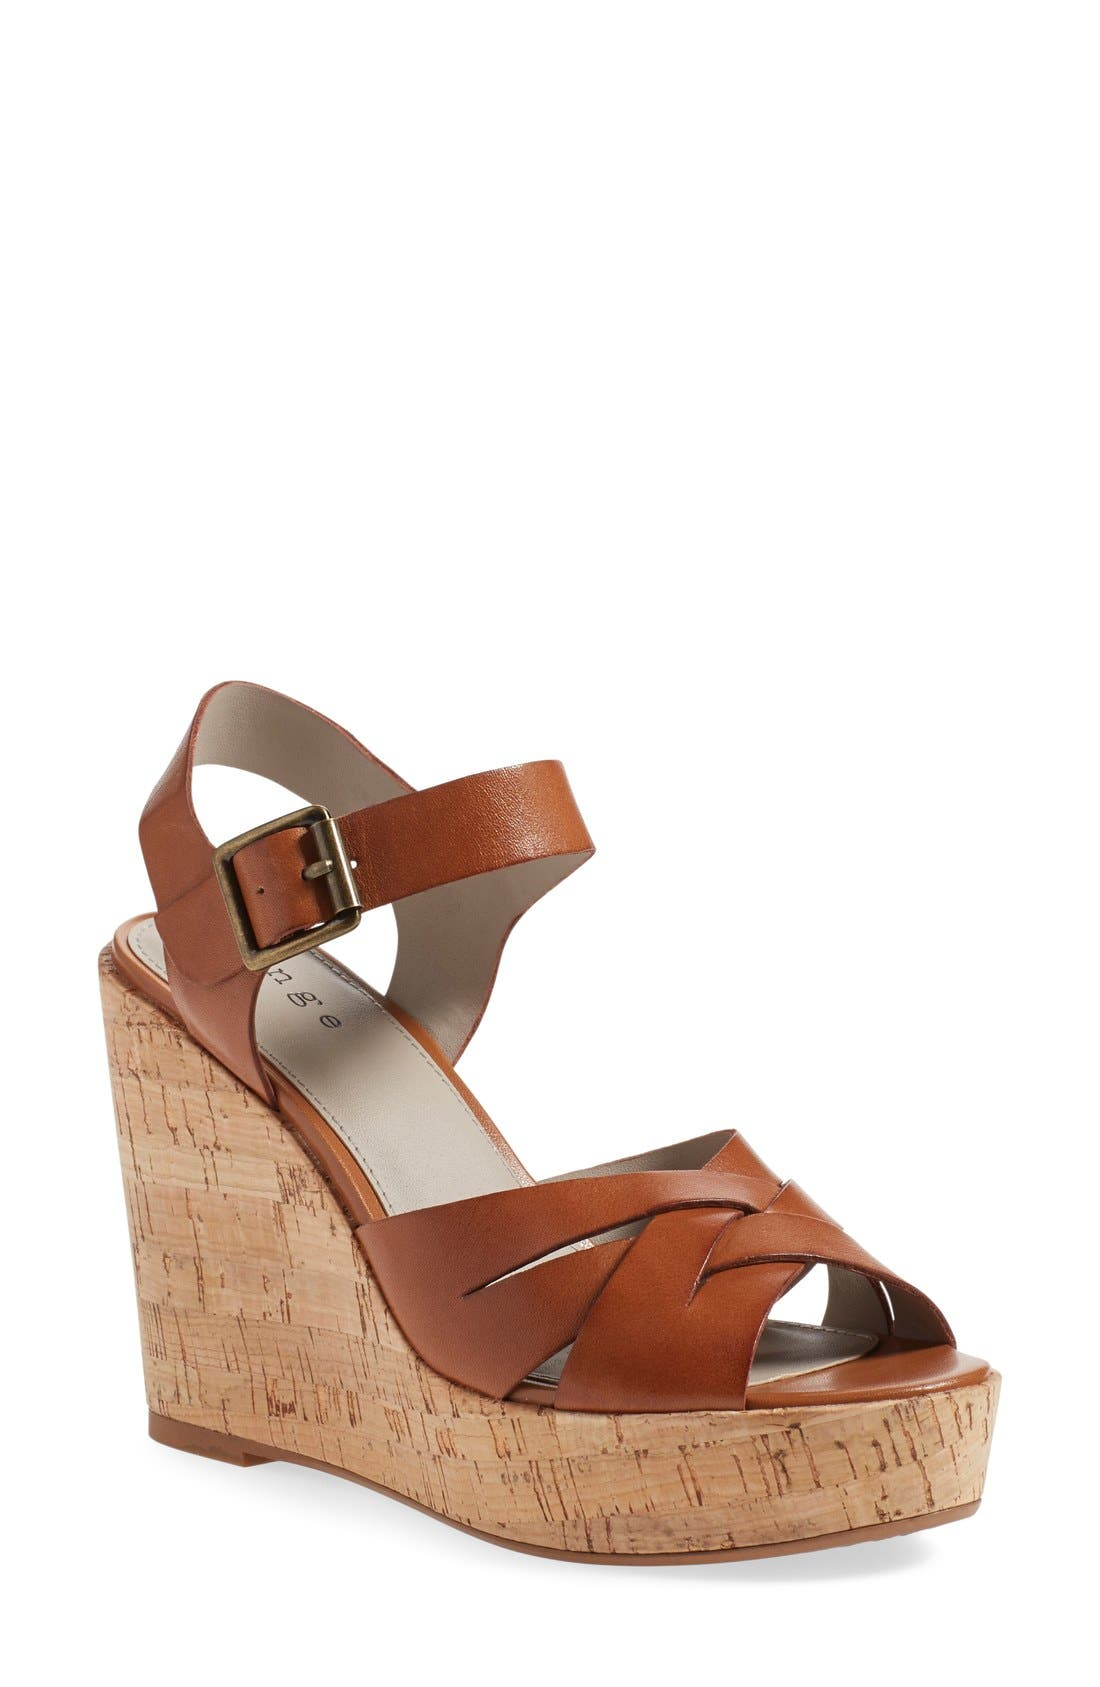 Main Image - Hinge 'Hadley' Wedge Sandal (Women)